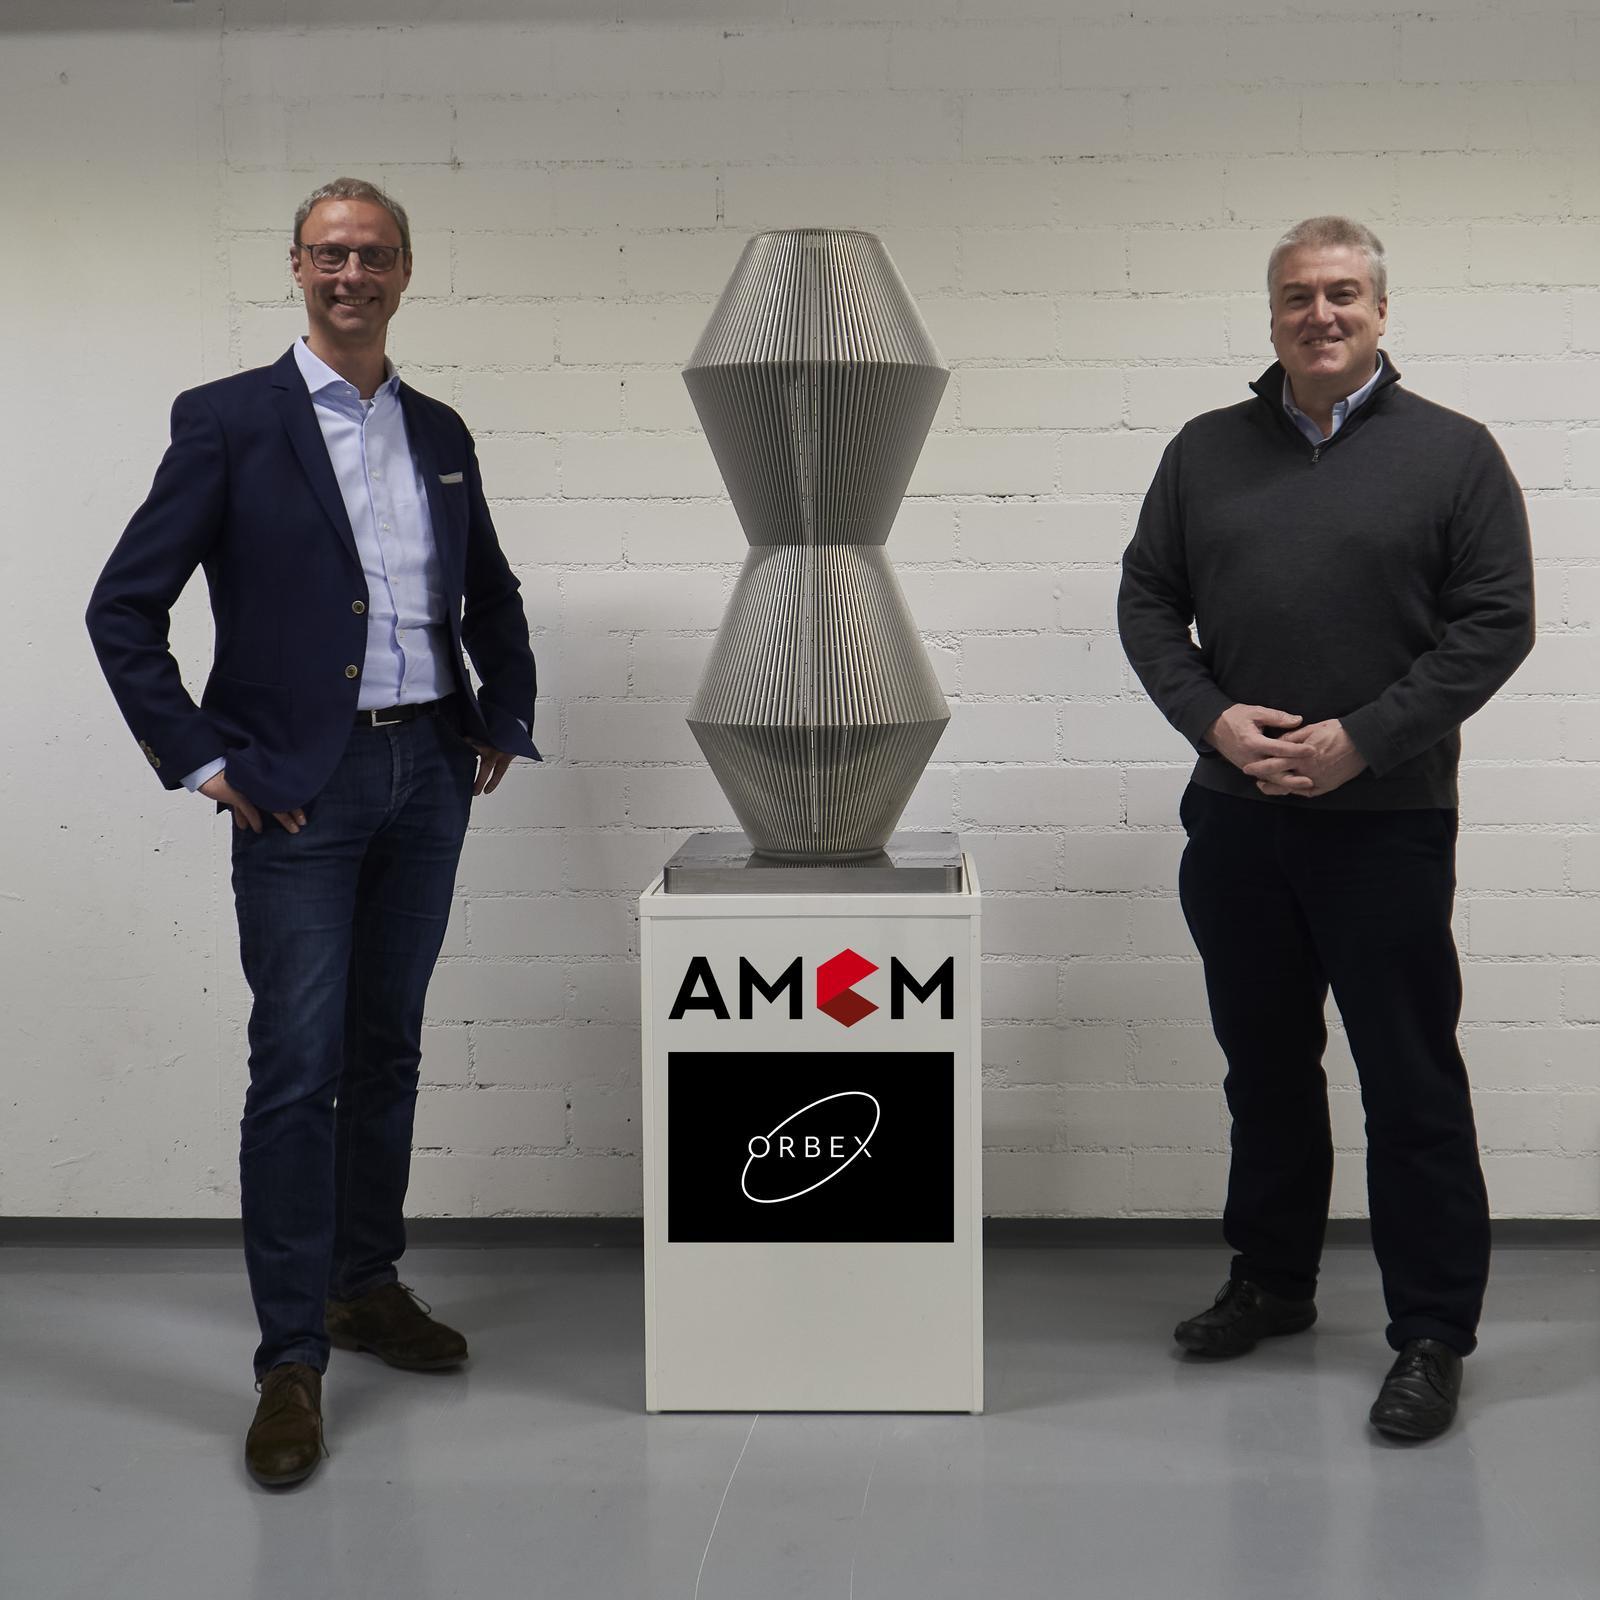 Martin Bullemer and Chris Larmour